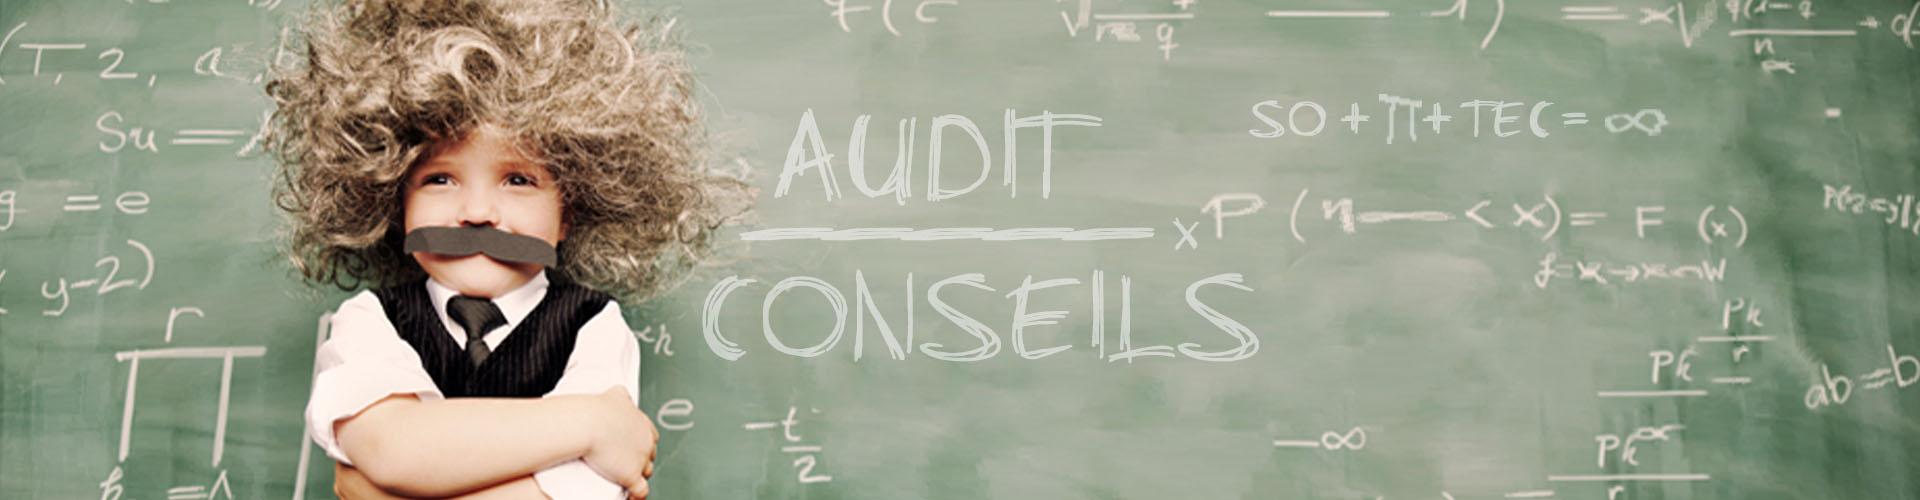 sopitec-lyon-nantes-slide-audits-conseils